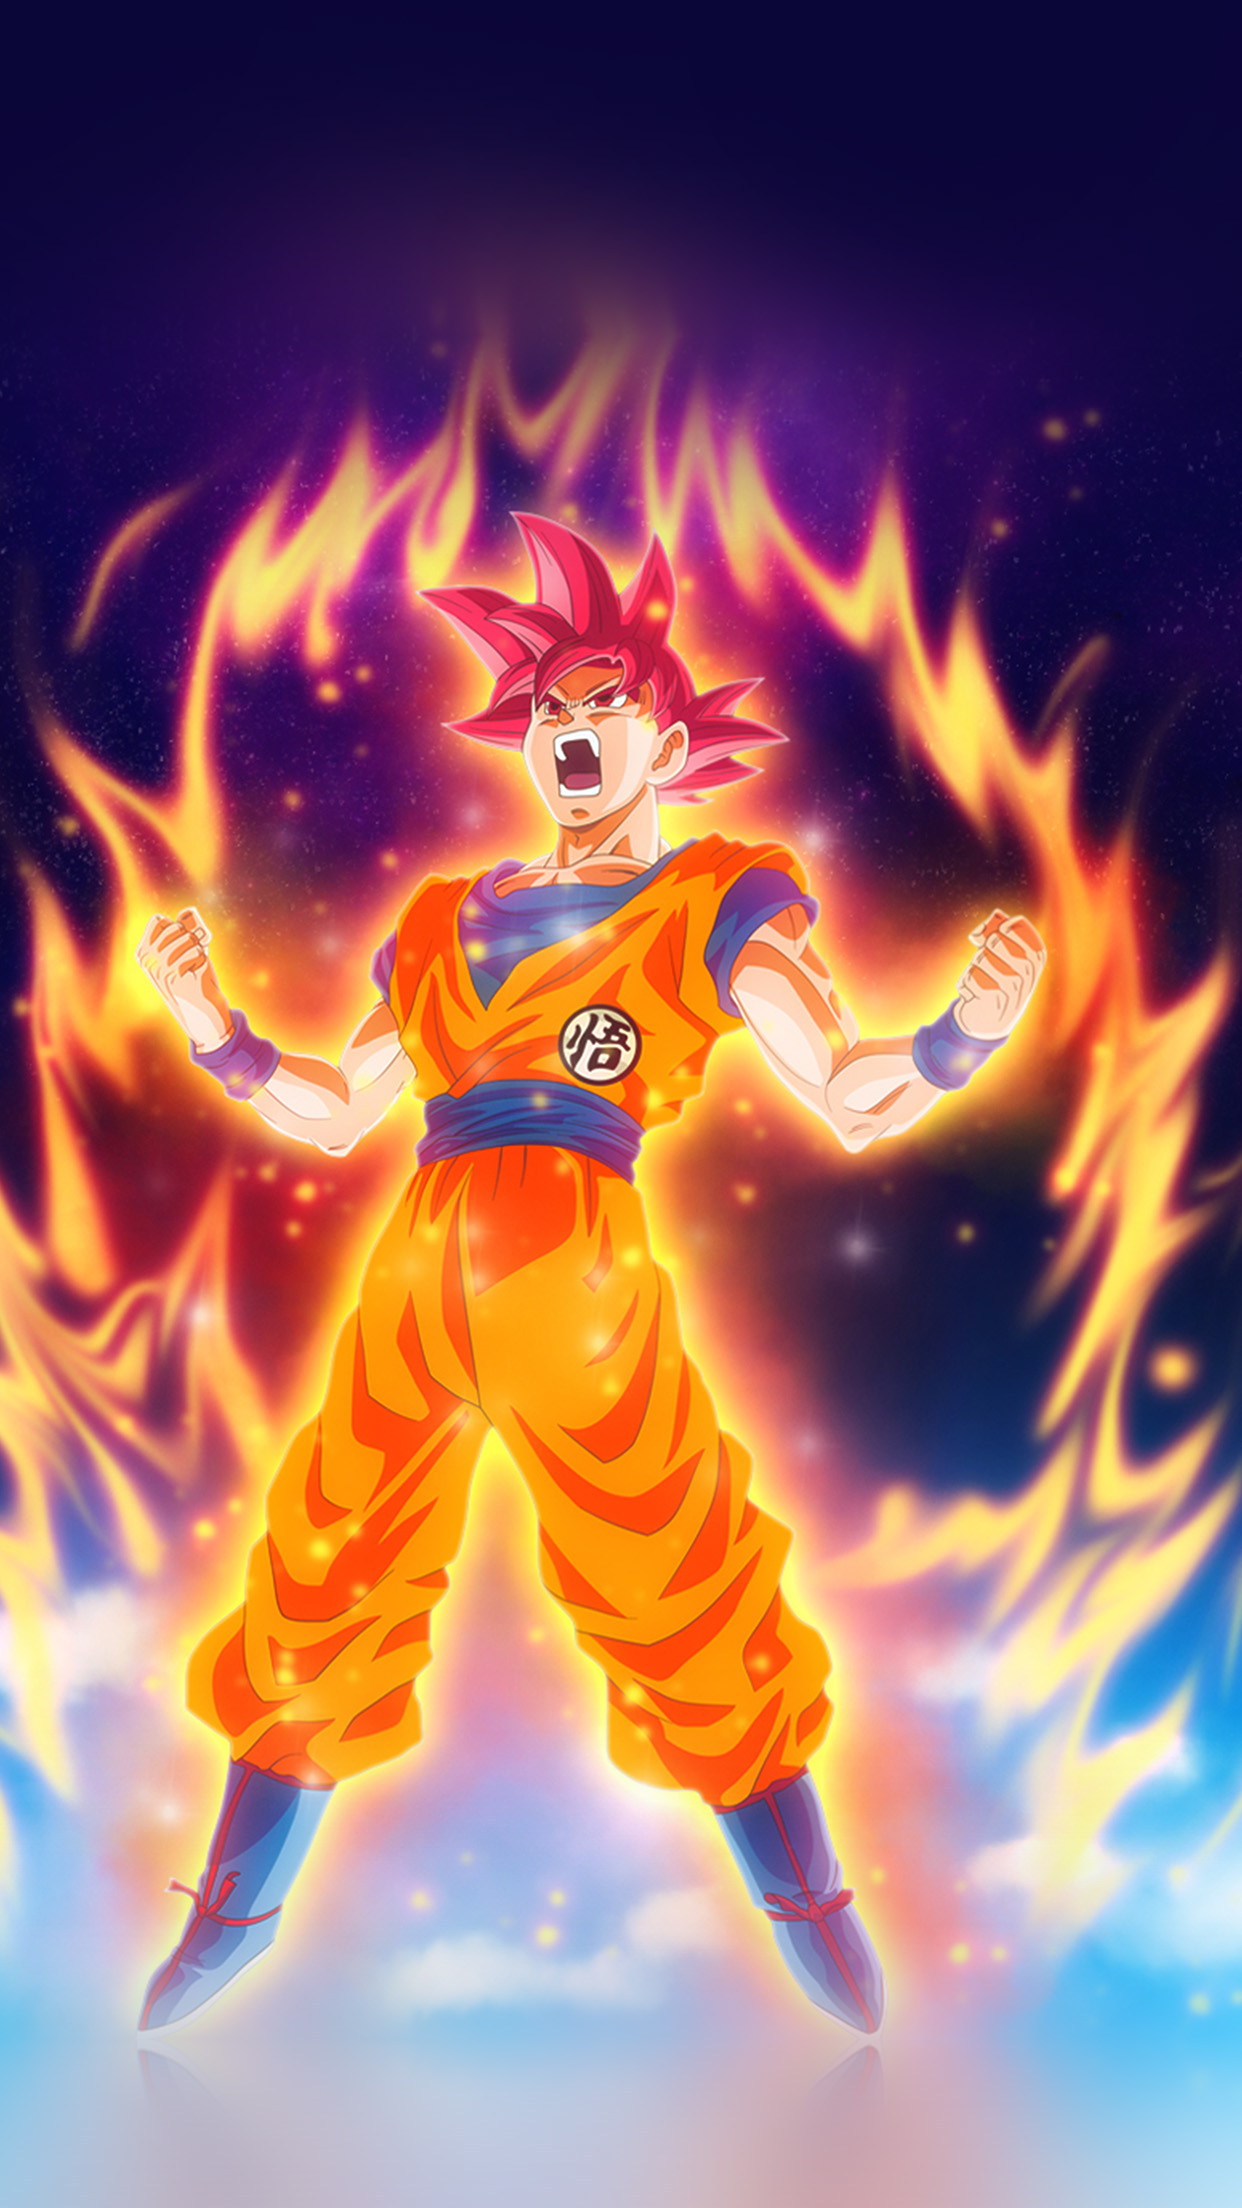 Car Fire Wallpaper Be62 Dragon Ball Fire Art Illustration Hero Anime Wallpaper